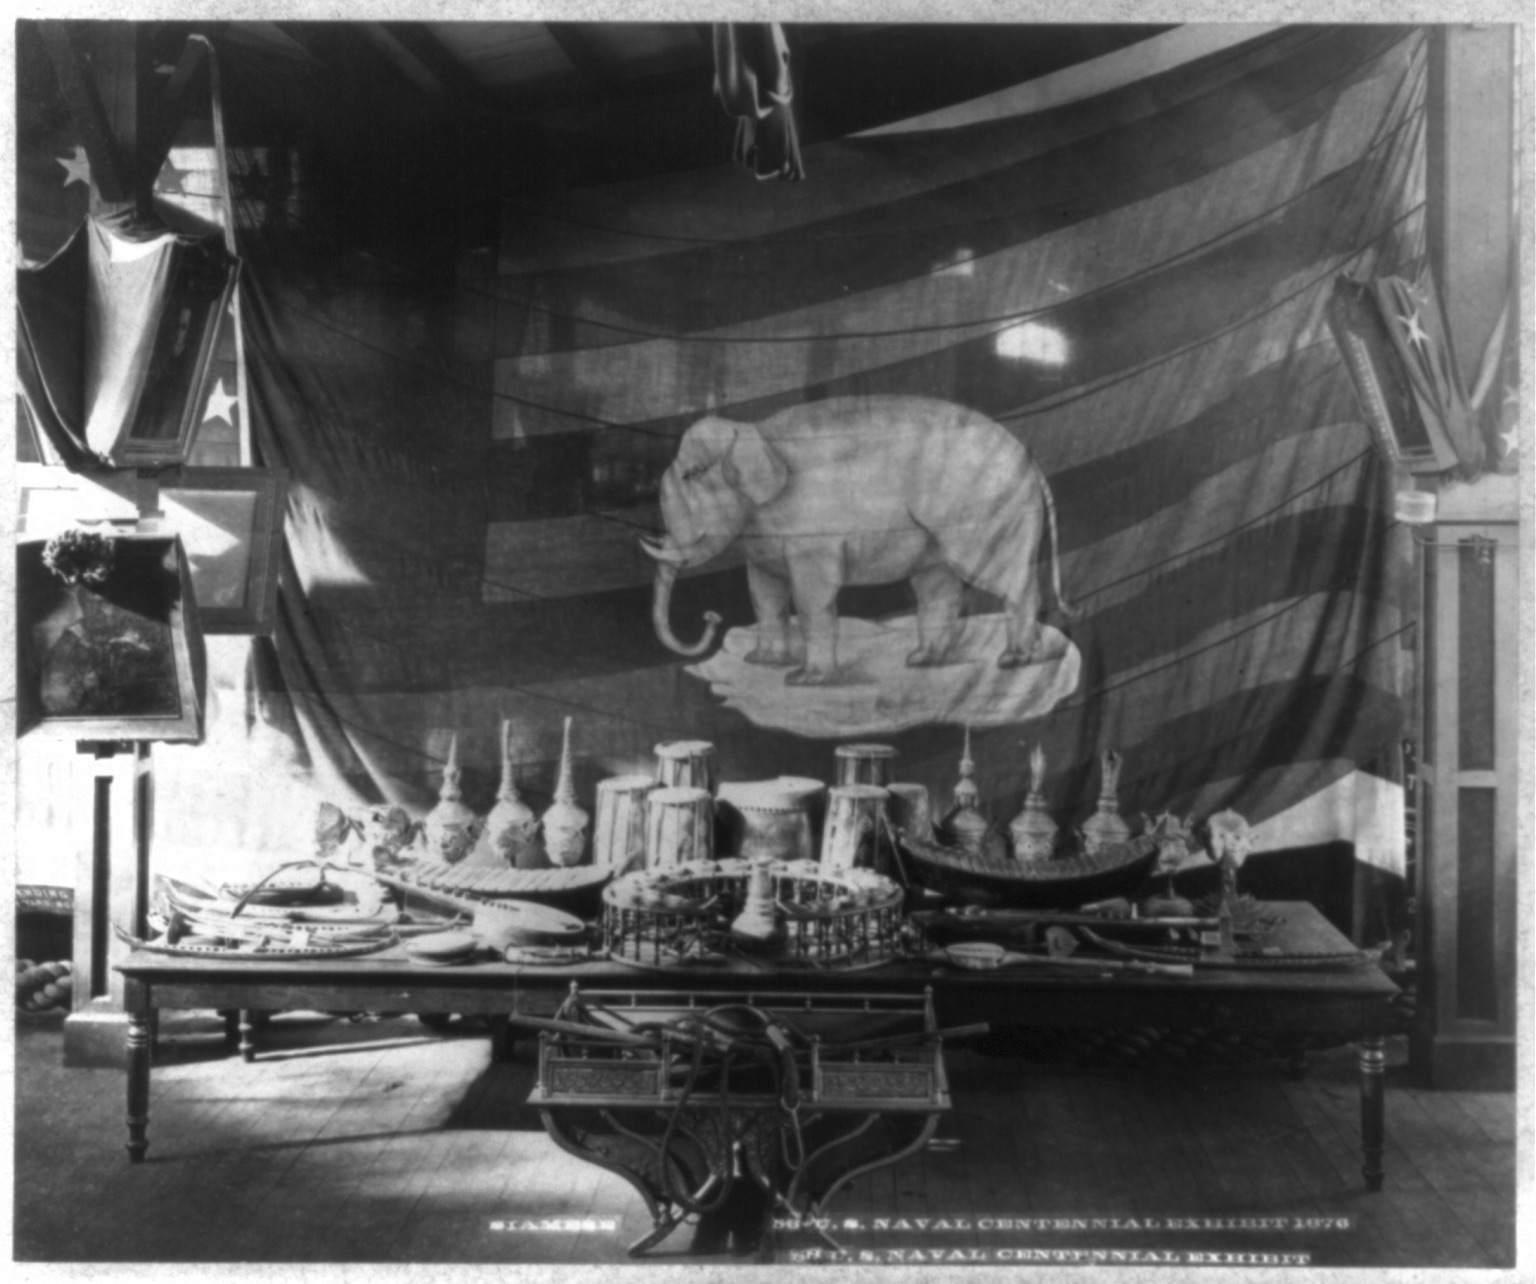 Siam display of  khon  masks and instruments at the Centennial Exposition, 1876, Philadelphia, Pennsylvania  หัวโขนและเครื่องดนตรีจากสยามที่จัดแสดงในการแสดงนิทรรศการเฉลิมฉลองครบรอบหนึ่งร้อยปีของสหรัฐอเมริกา พ.ศ. 2419เมืองฟิลาเดลเฟีย รัฐเพนซิลเวเนีย